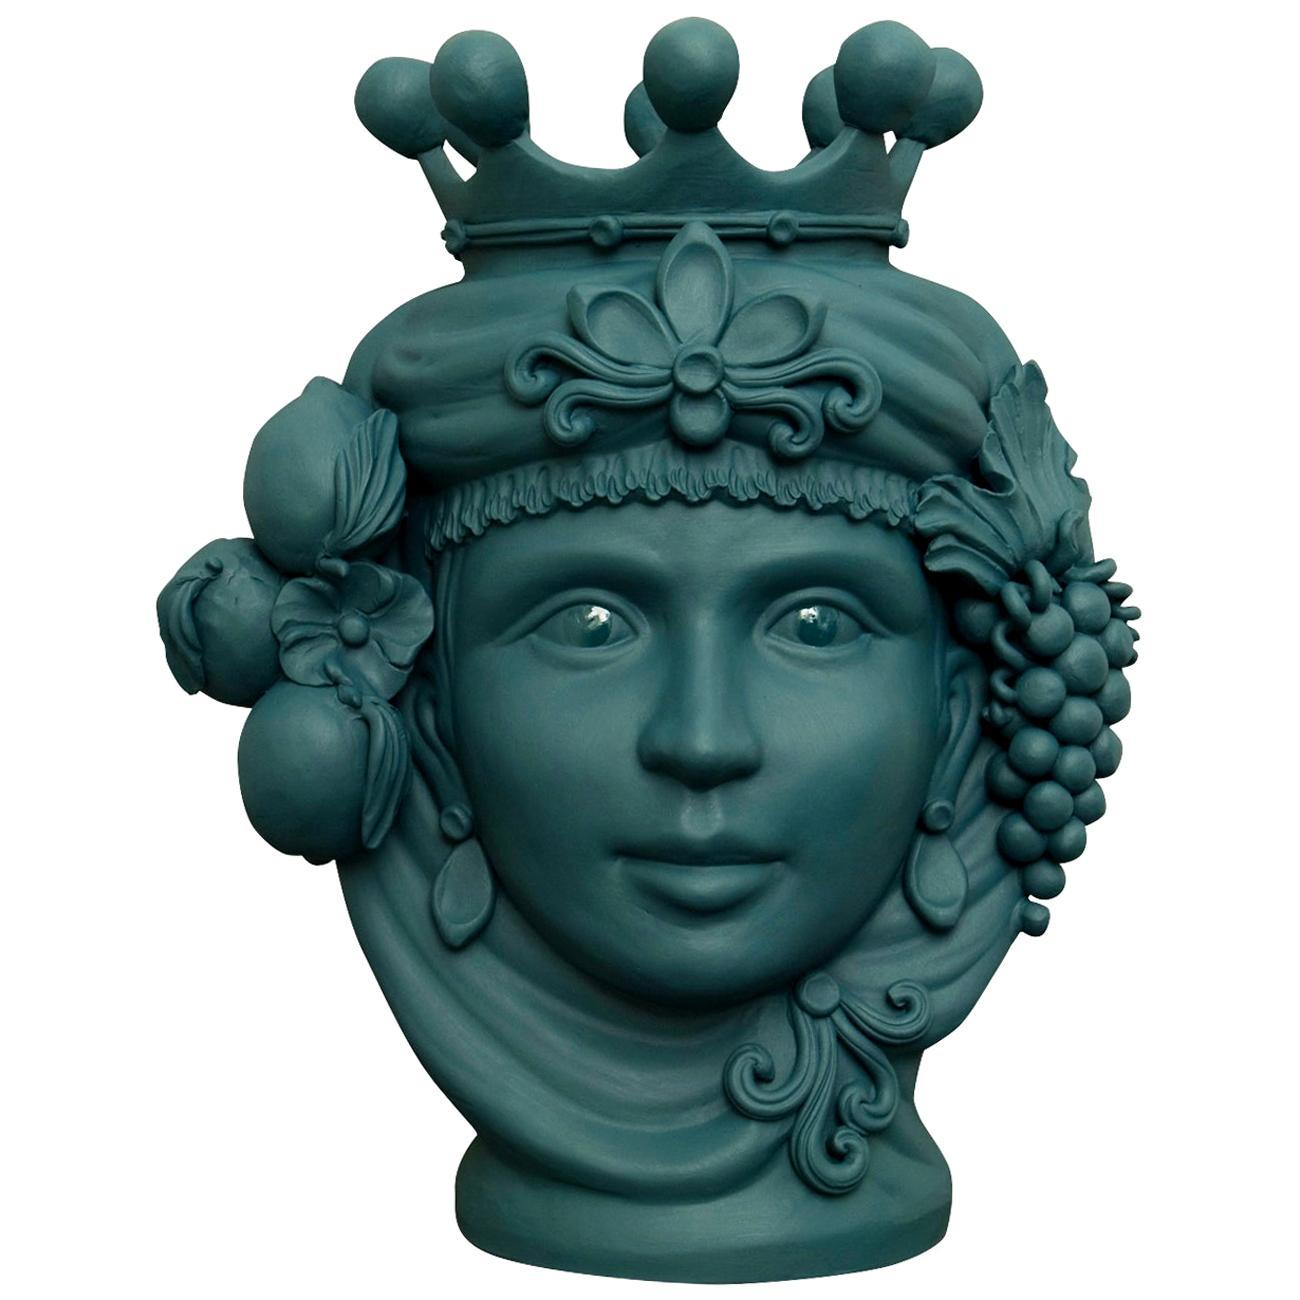 Matte Green Sicilian Terracotta Vase Designed by Stefania Boemi